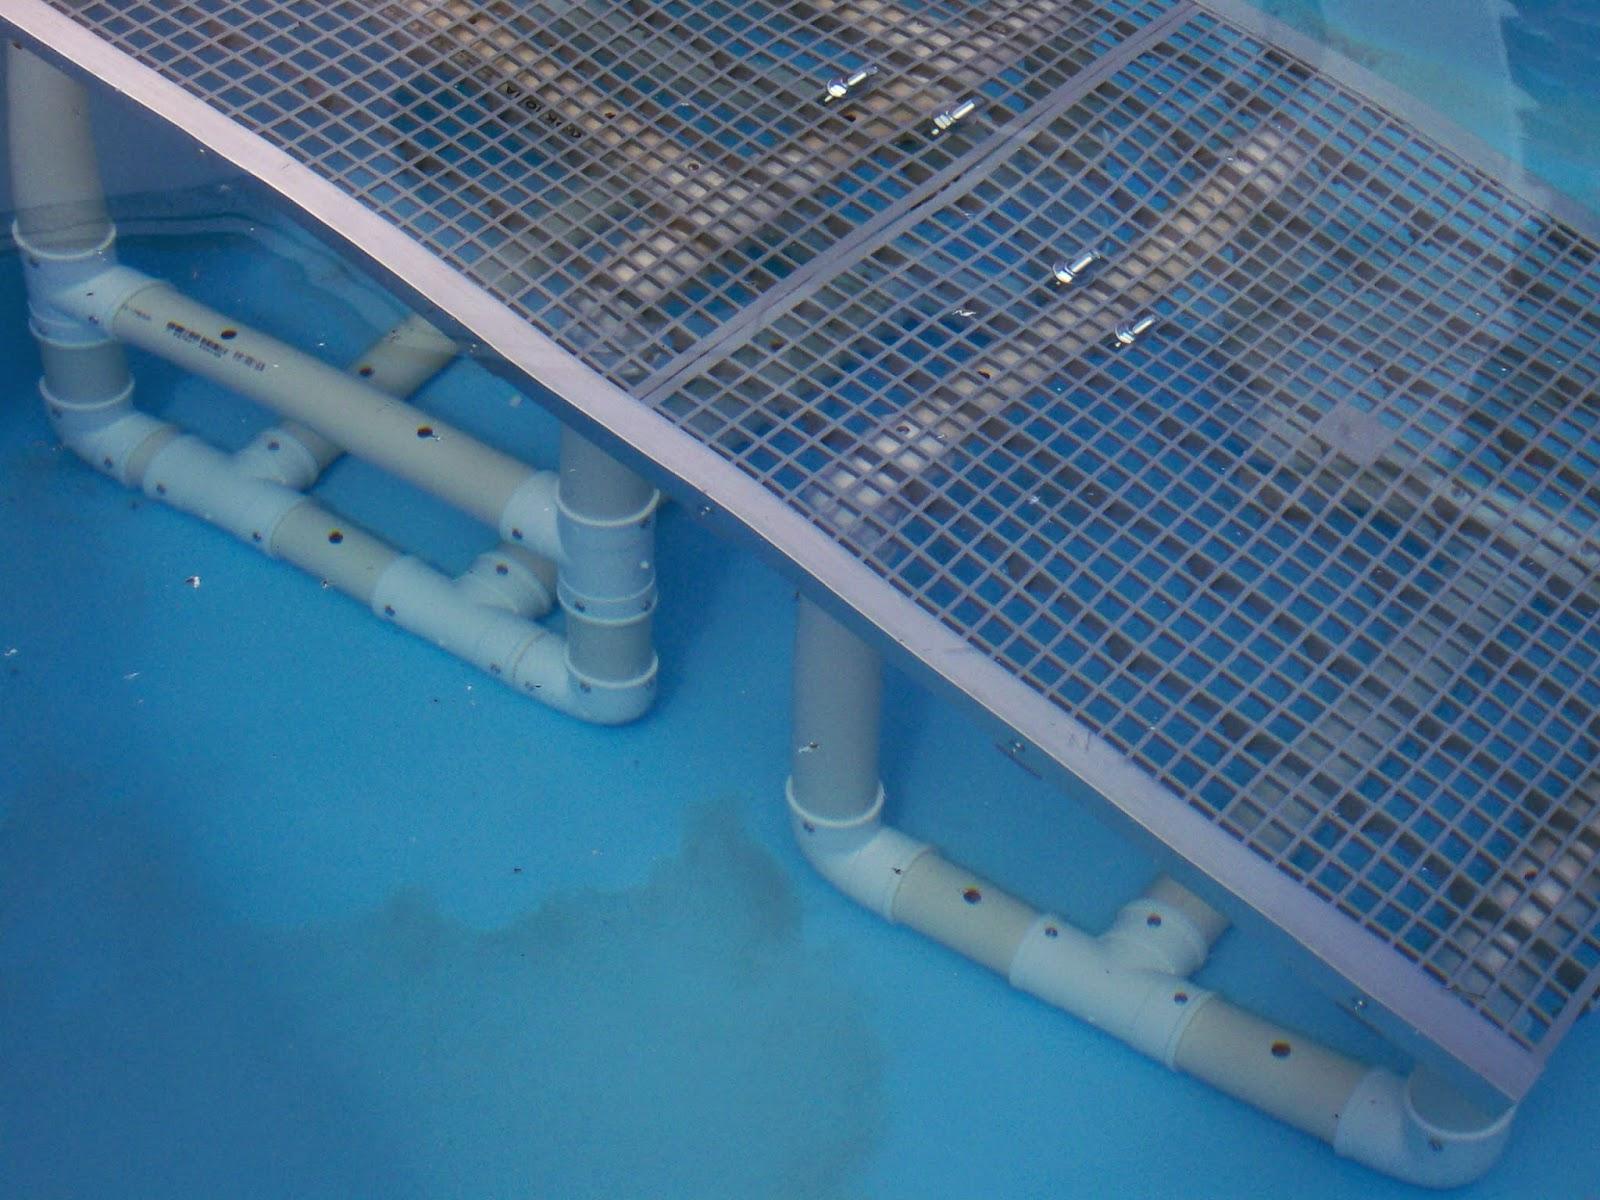 C es como sair de piscinas petescadas for Plataforma para piscina